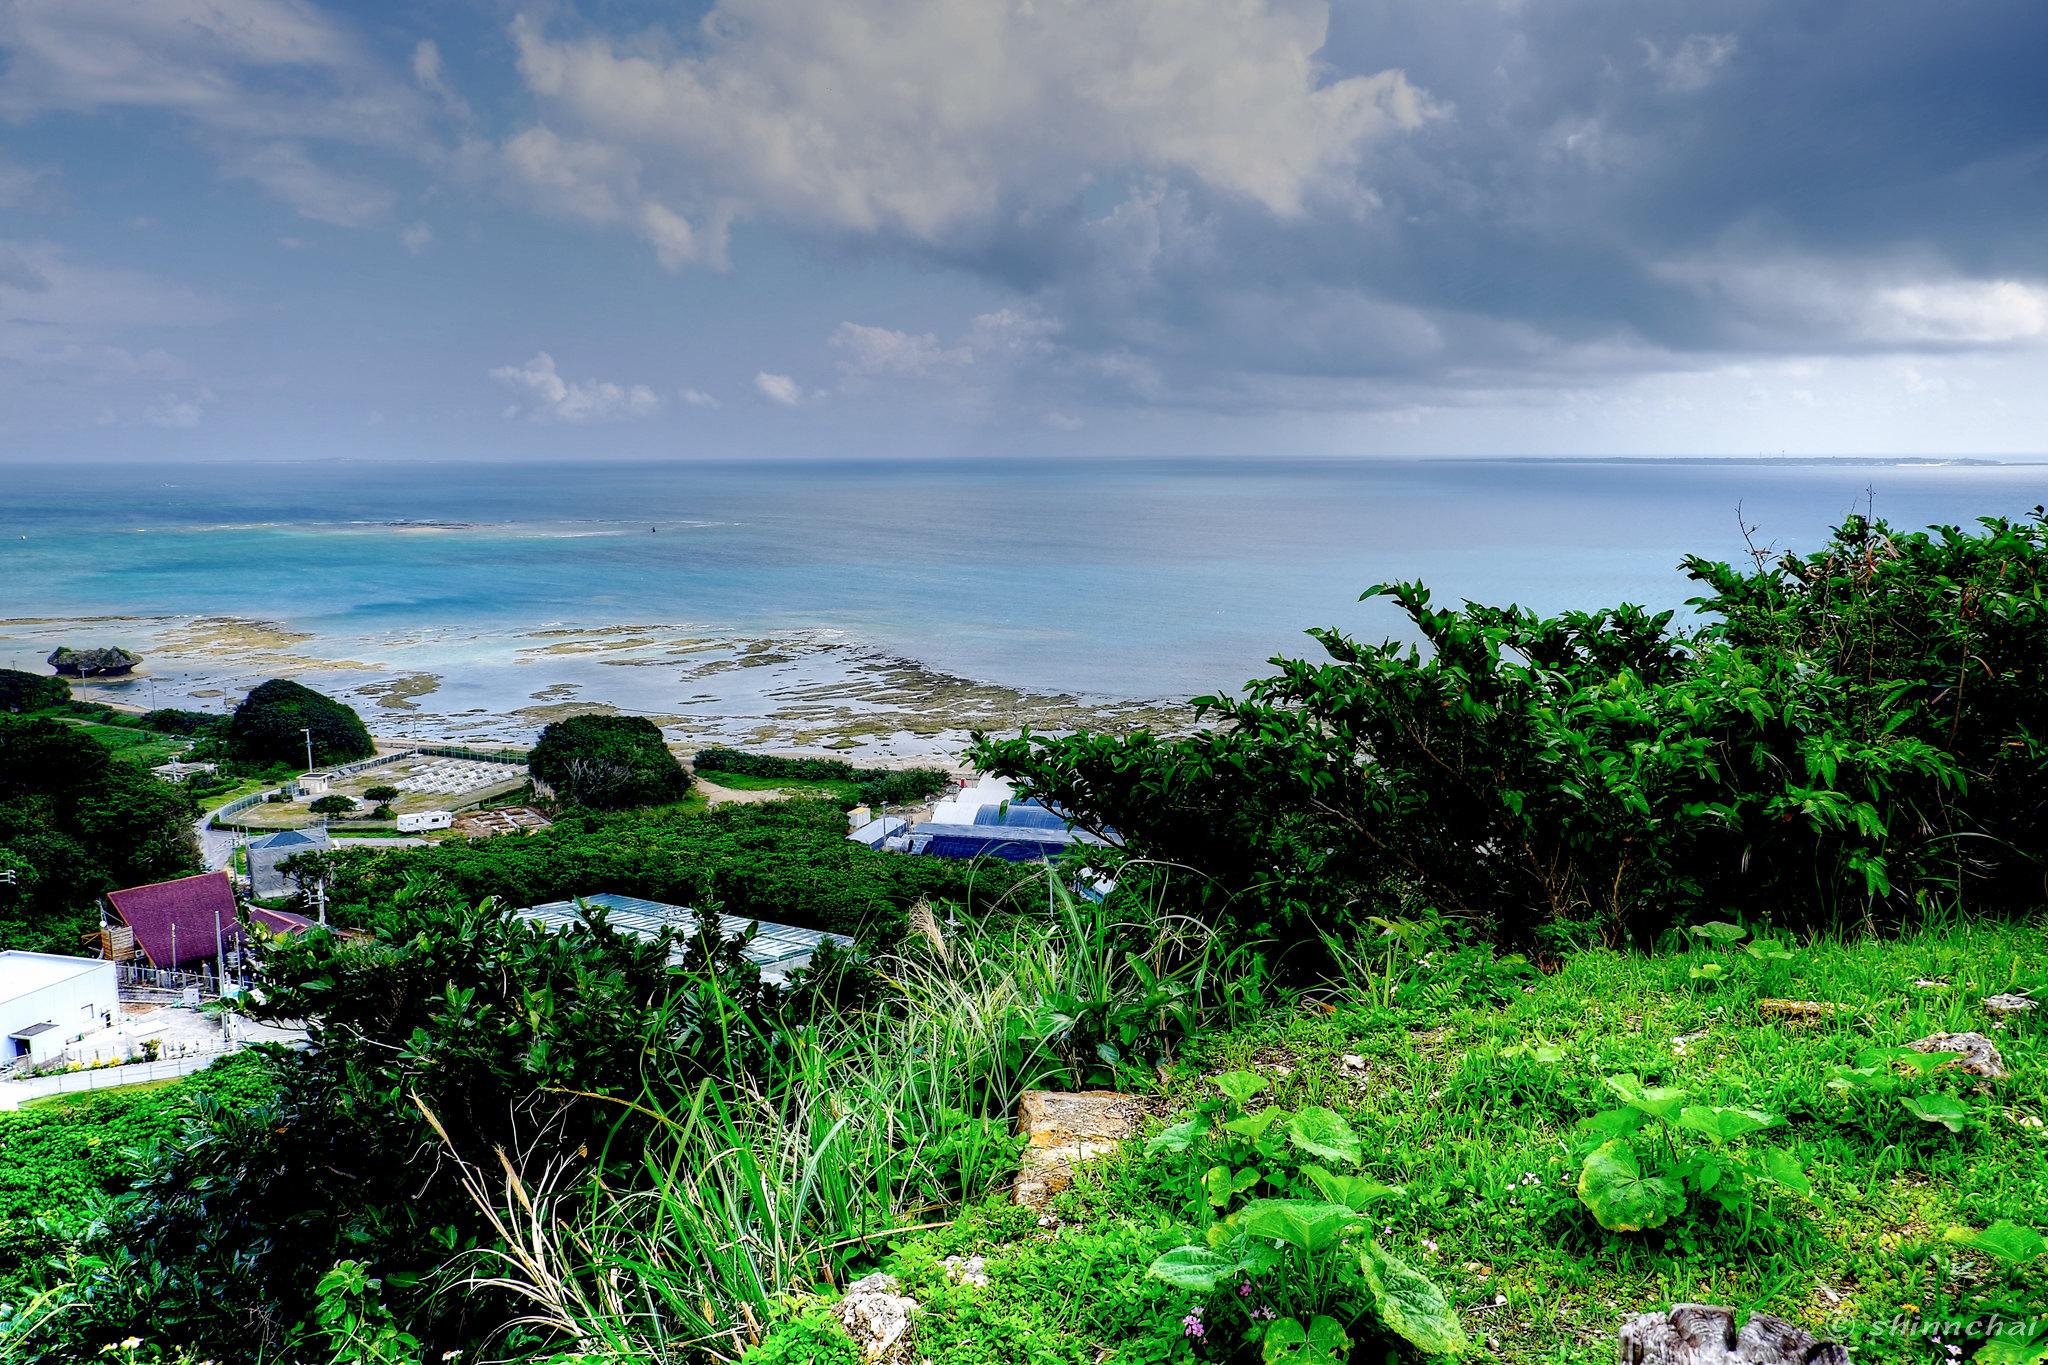 xf18-55mm f2.8-4 r lm ois 作例 レビュー 沖縄 草原と海